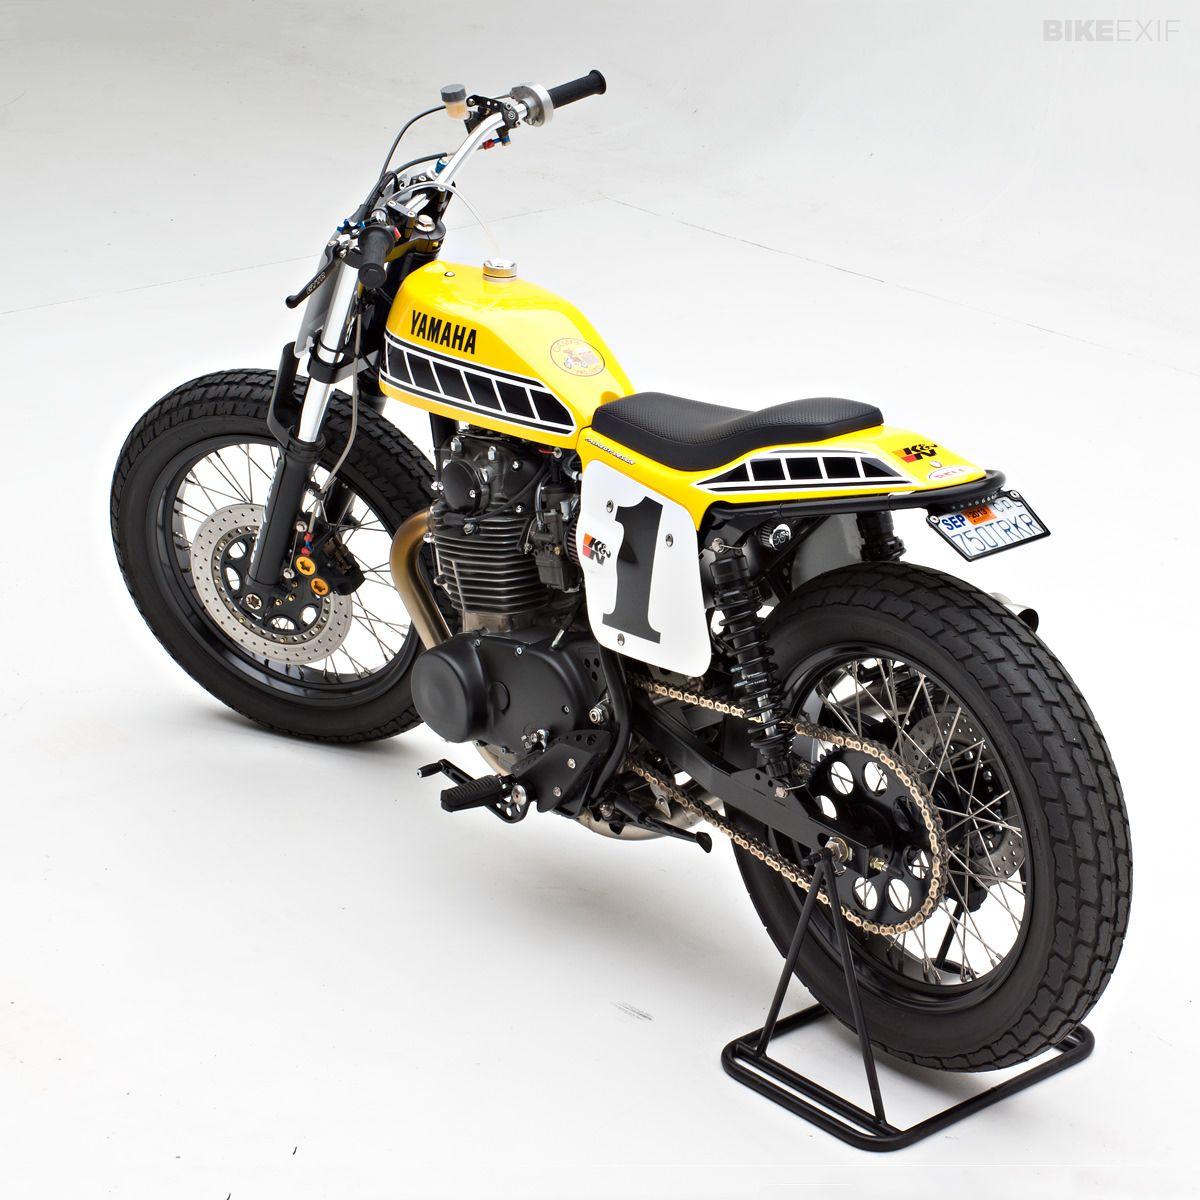 Yamaha Dirt Tracker By Jeff Palhegyi Bike Exif Tracker Motorcycle Bike Exif Racing Bikes